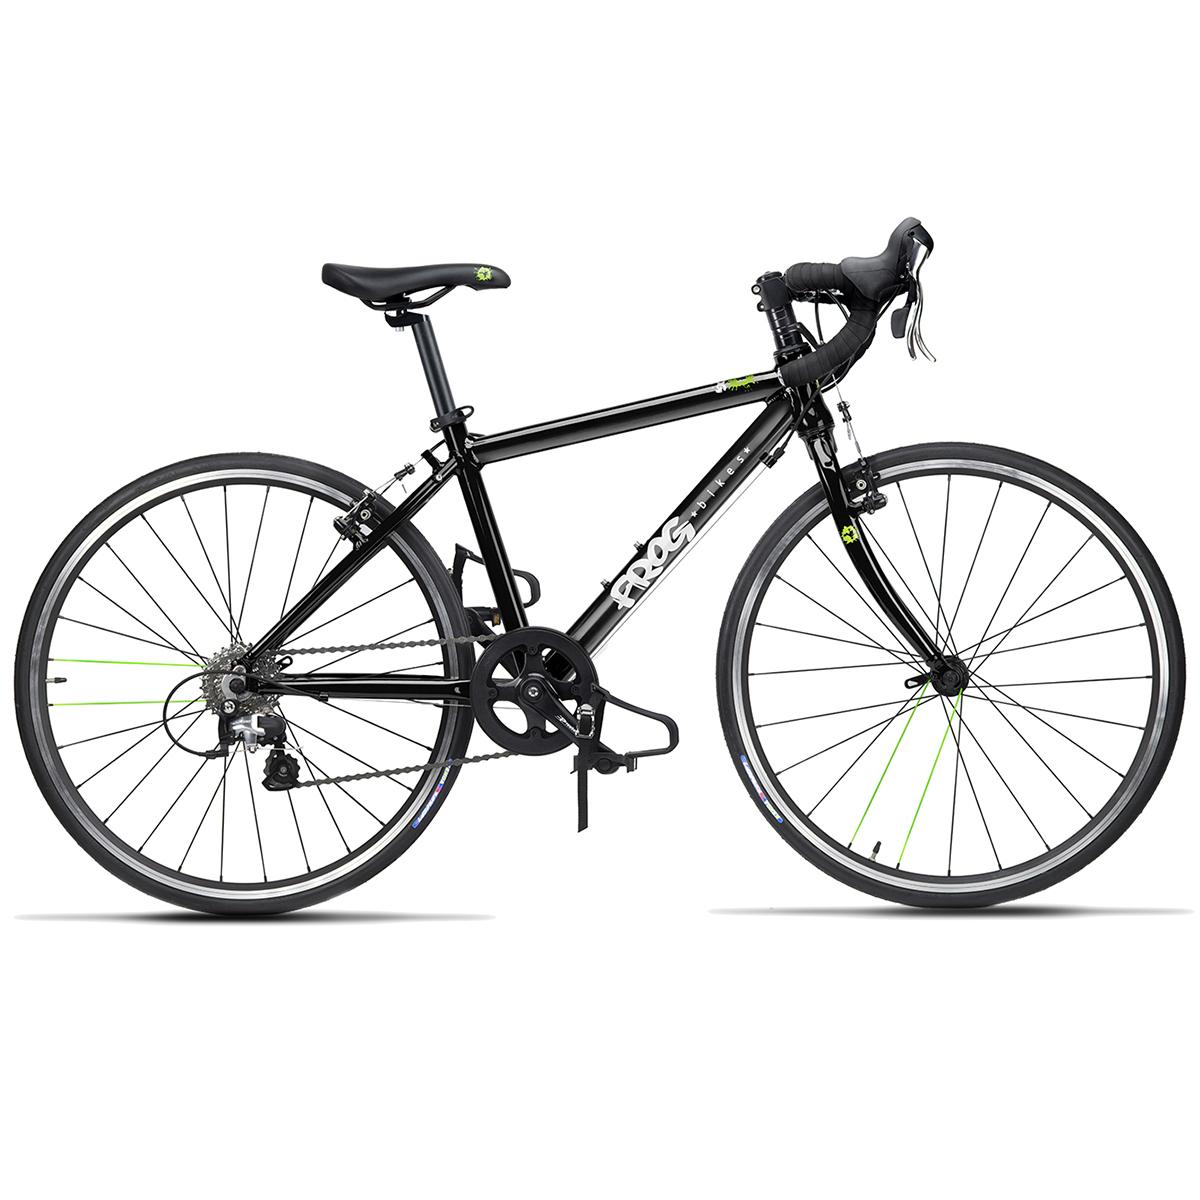 Frog 67 Kids Road Bike - £325 delivered at Merlin Cycles